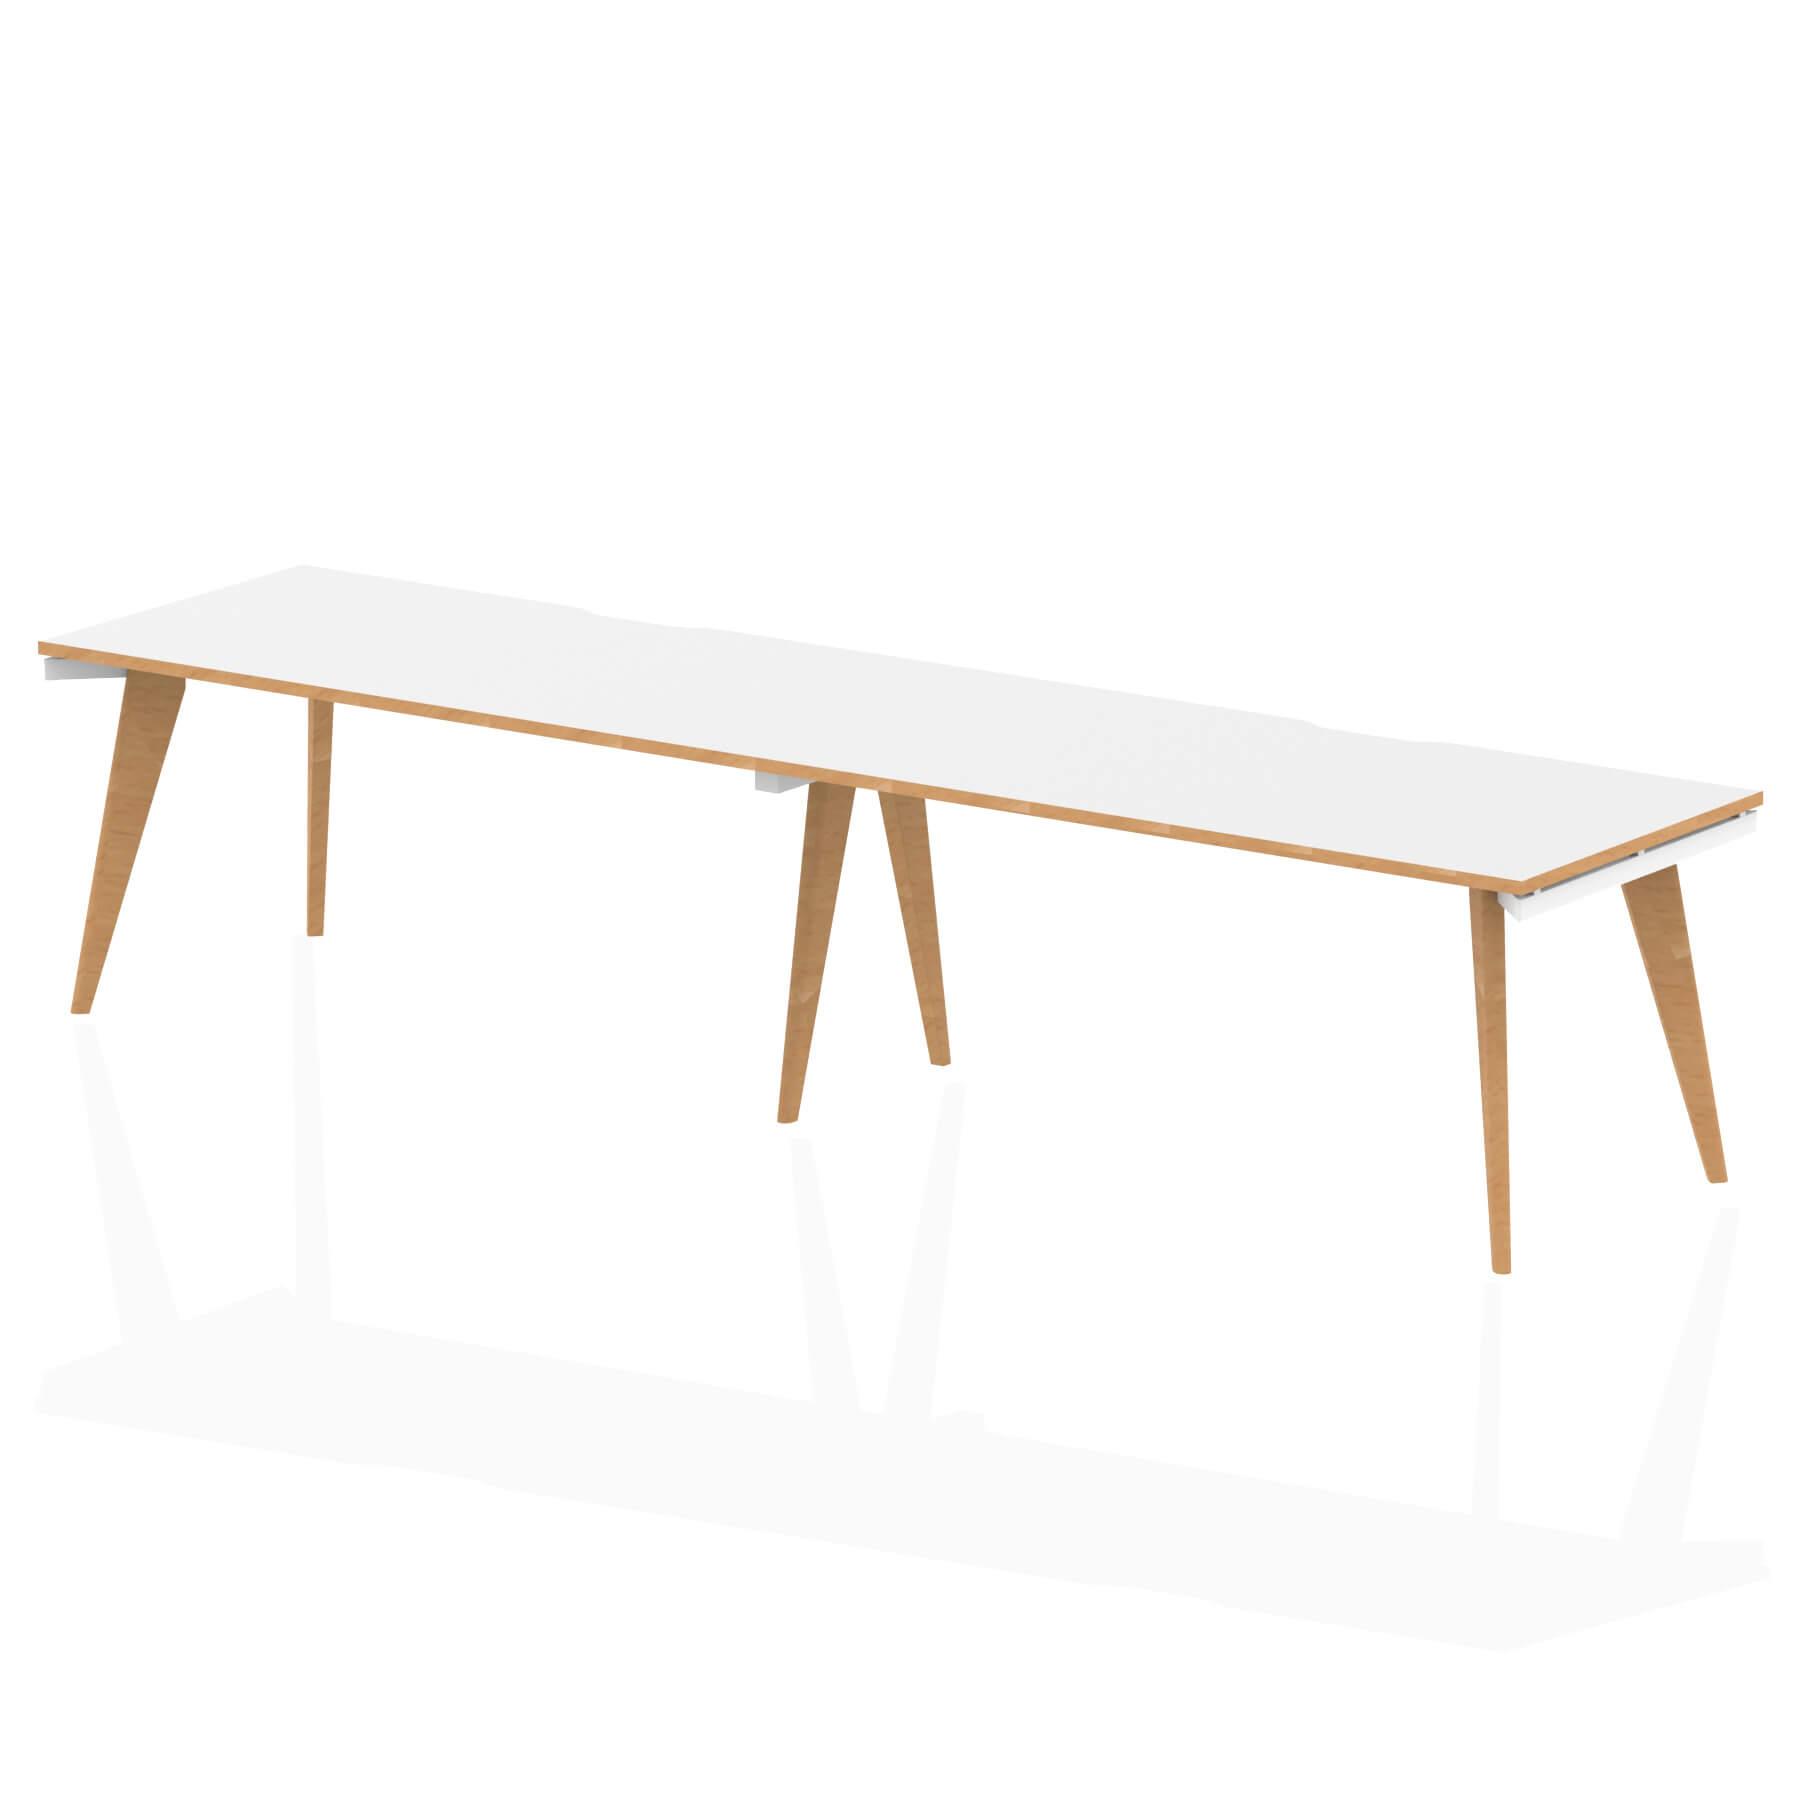 Oslo Single White Frame Wooden Leg Bench Desk 1600 White With Natural Wood Edge (2 Pod)